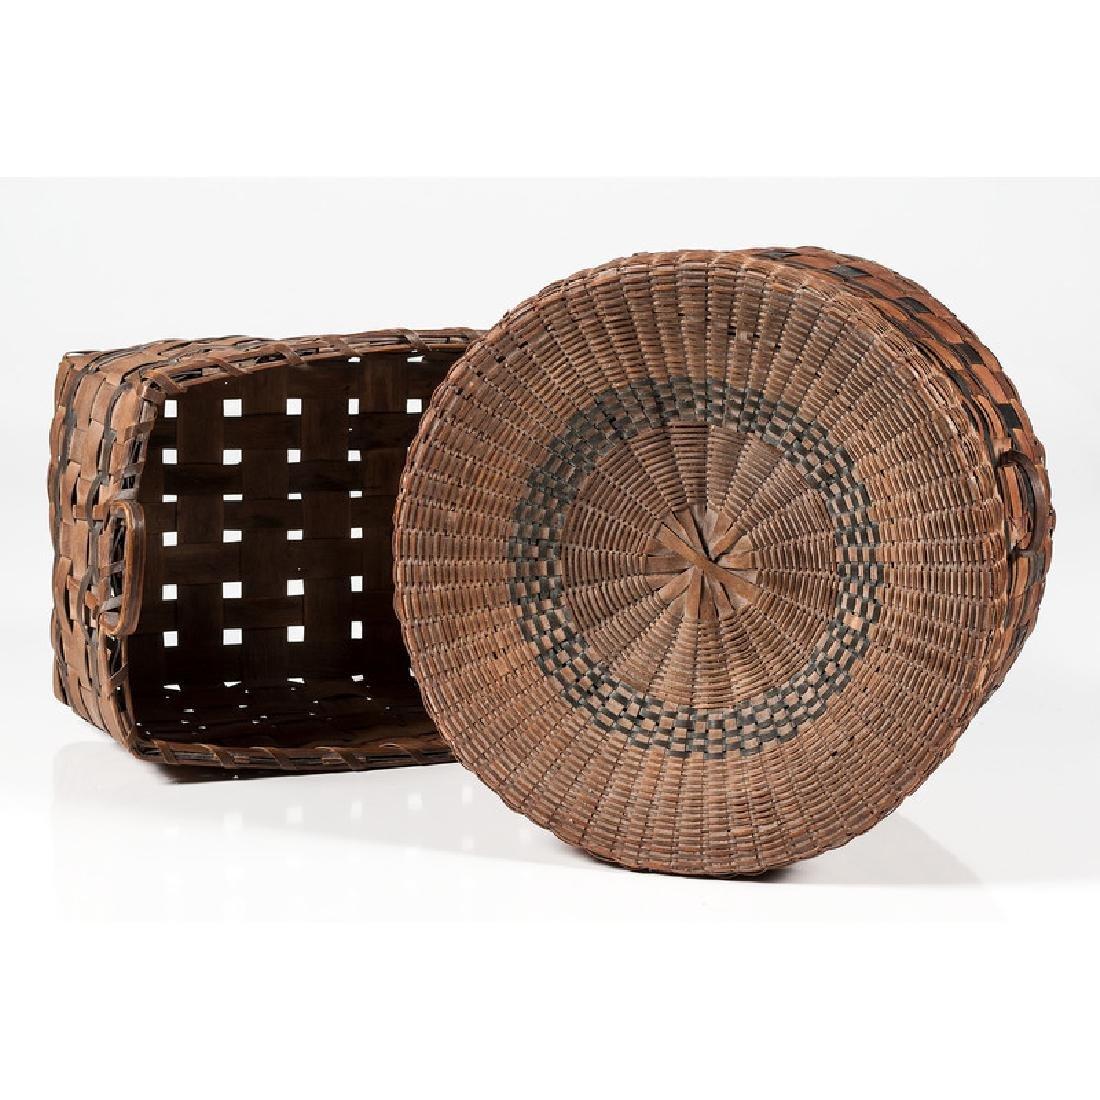 Polychrome Woven Baskets - 3